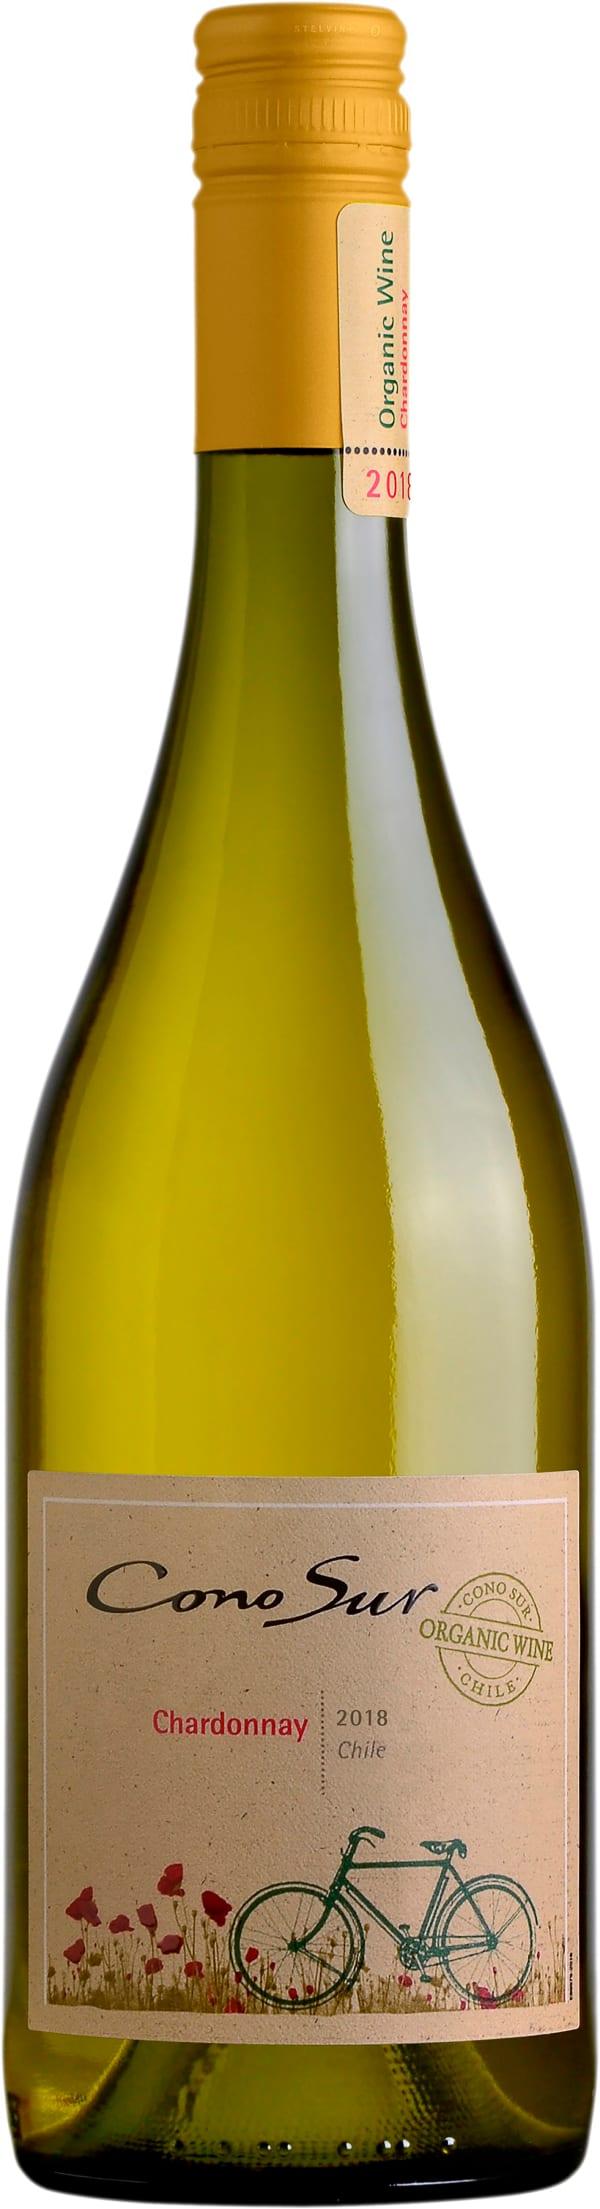 Cono Sur Organic Chardonnay 2018